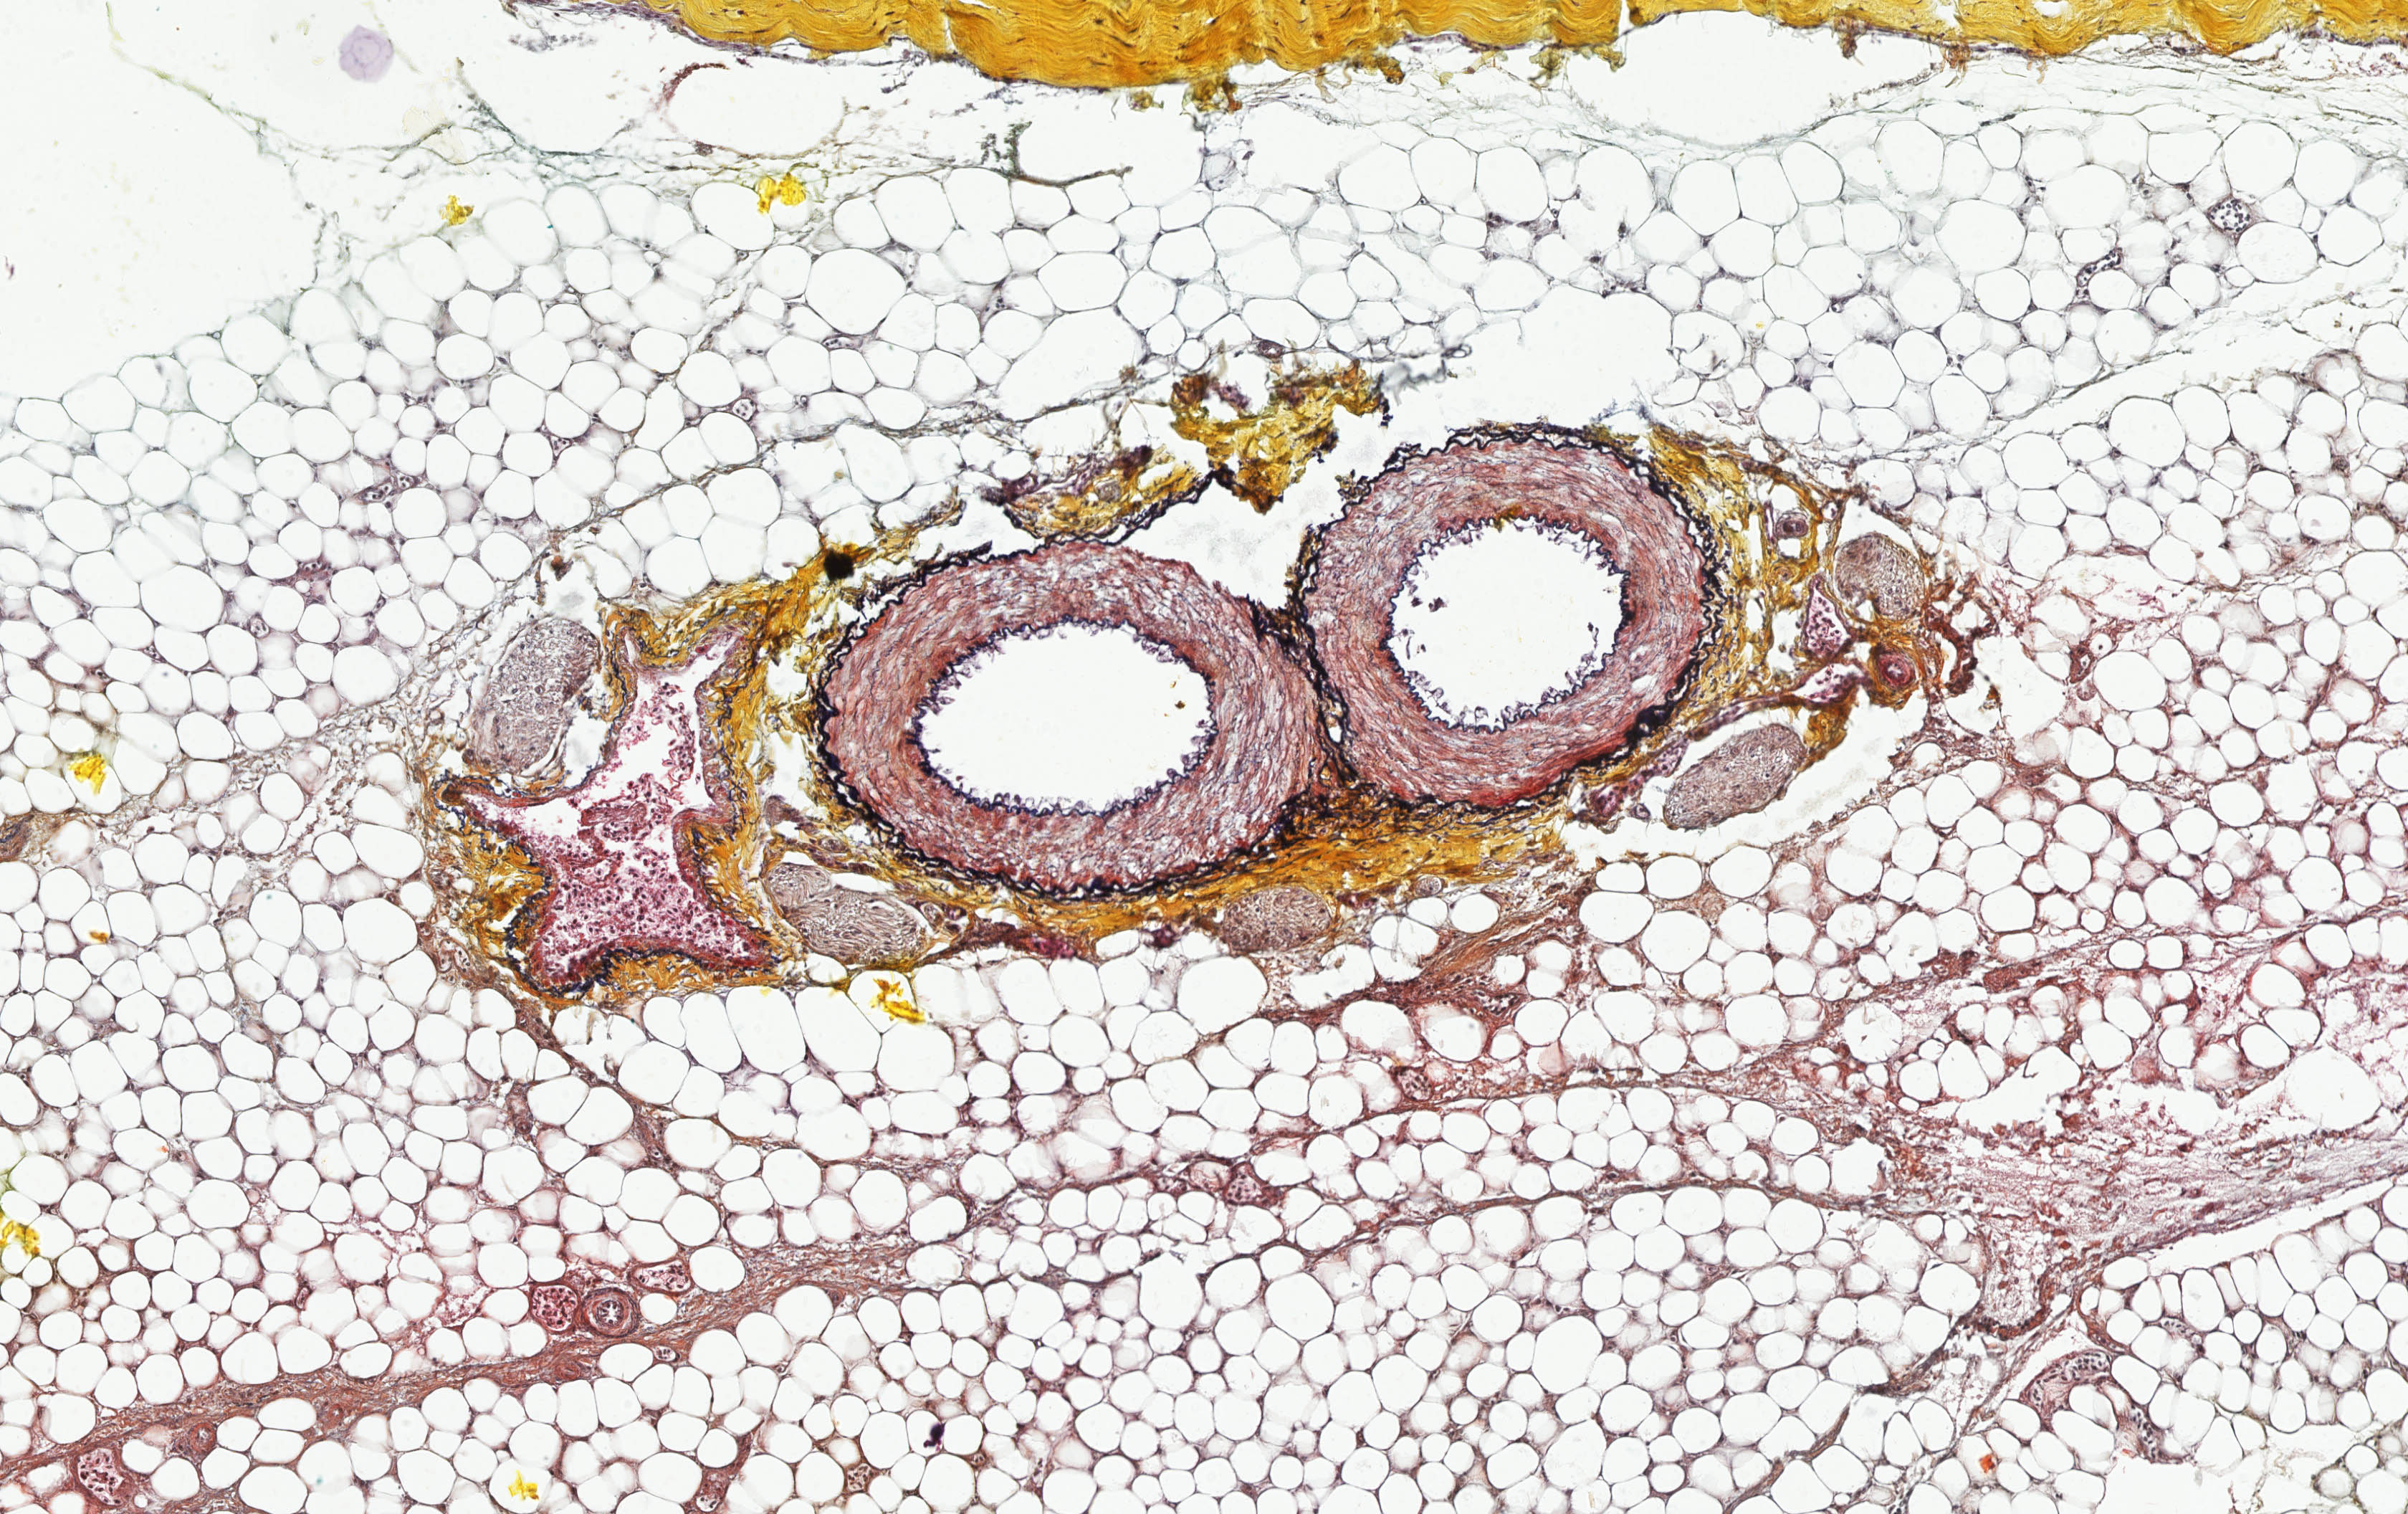 ALTHISIA movat pentachrome 9